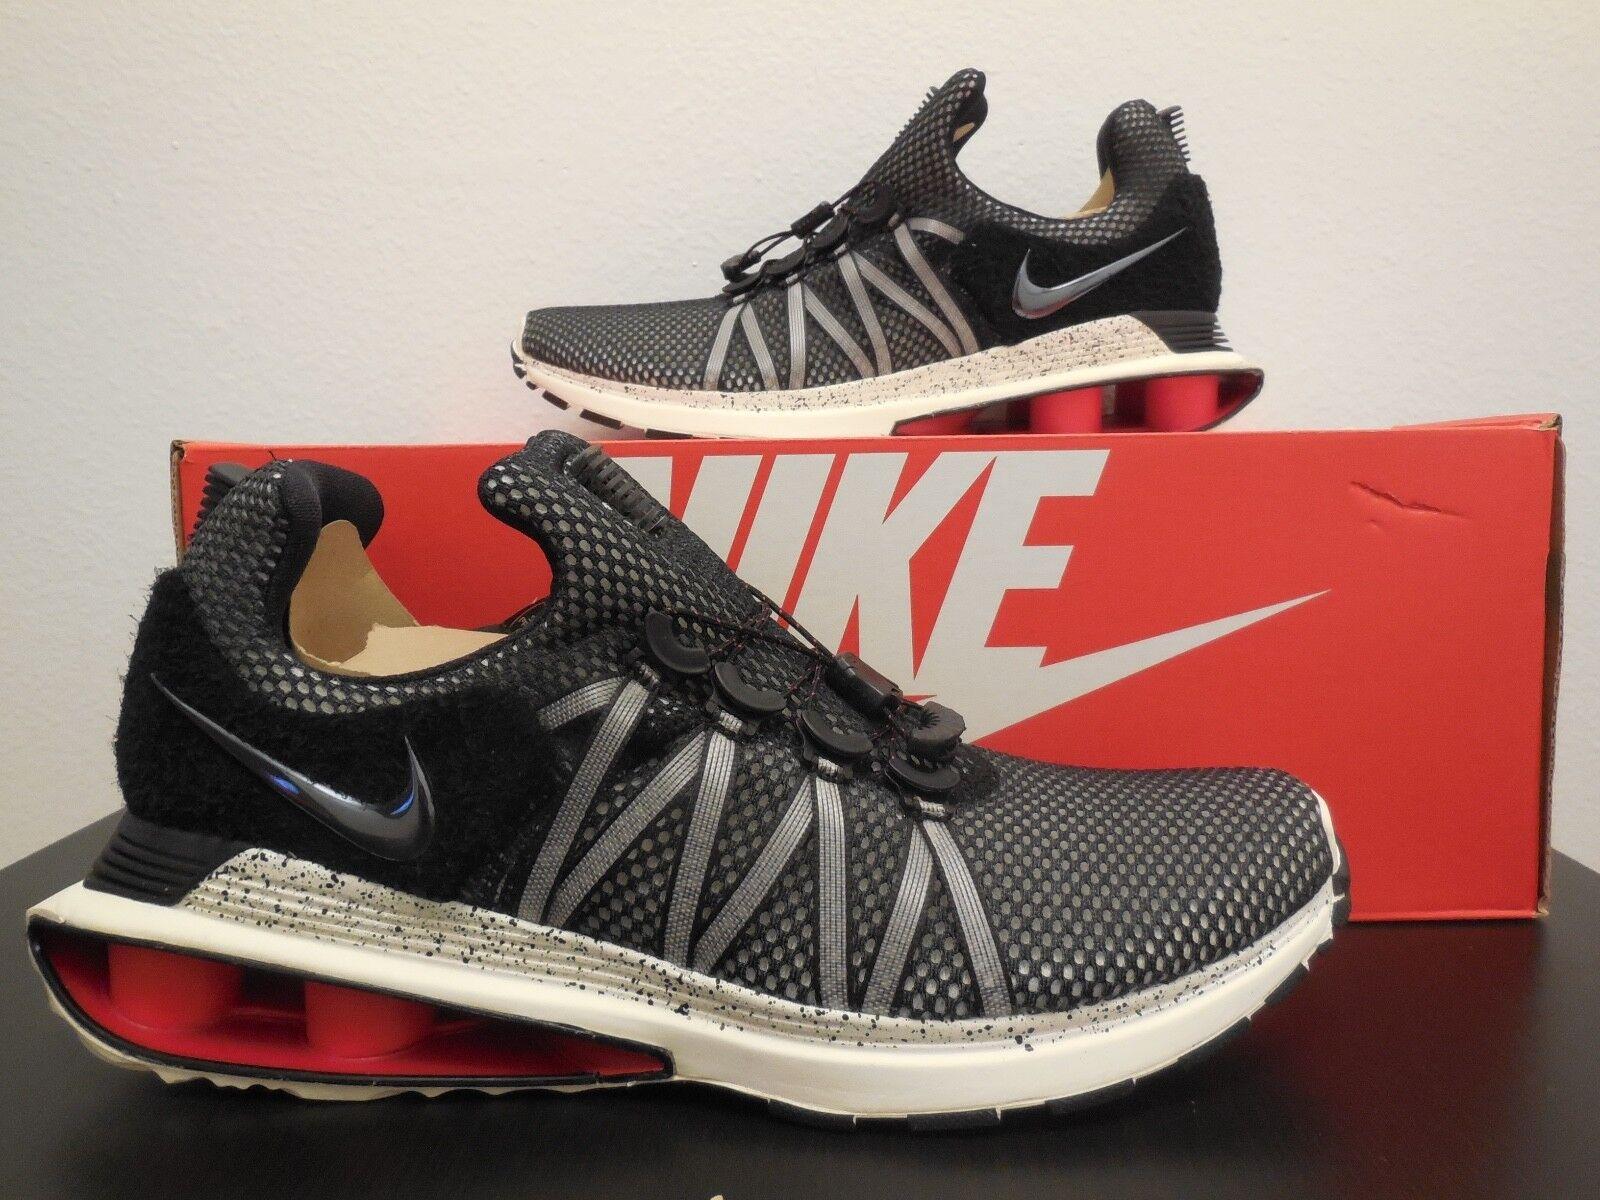 Uomini Shox Gravità Stylear1999 Le   Nike 150 Stylear1999 Gravità 006 Sz 10 - dfc35b